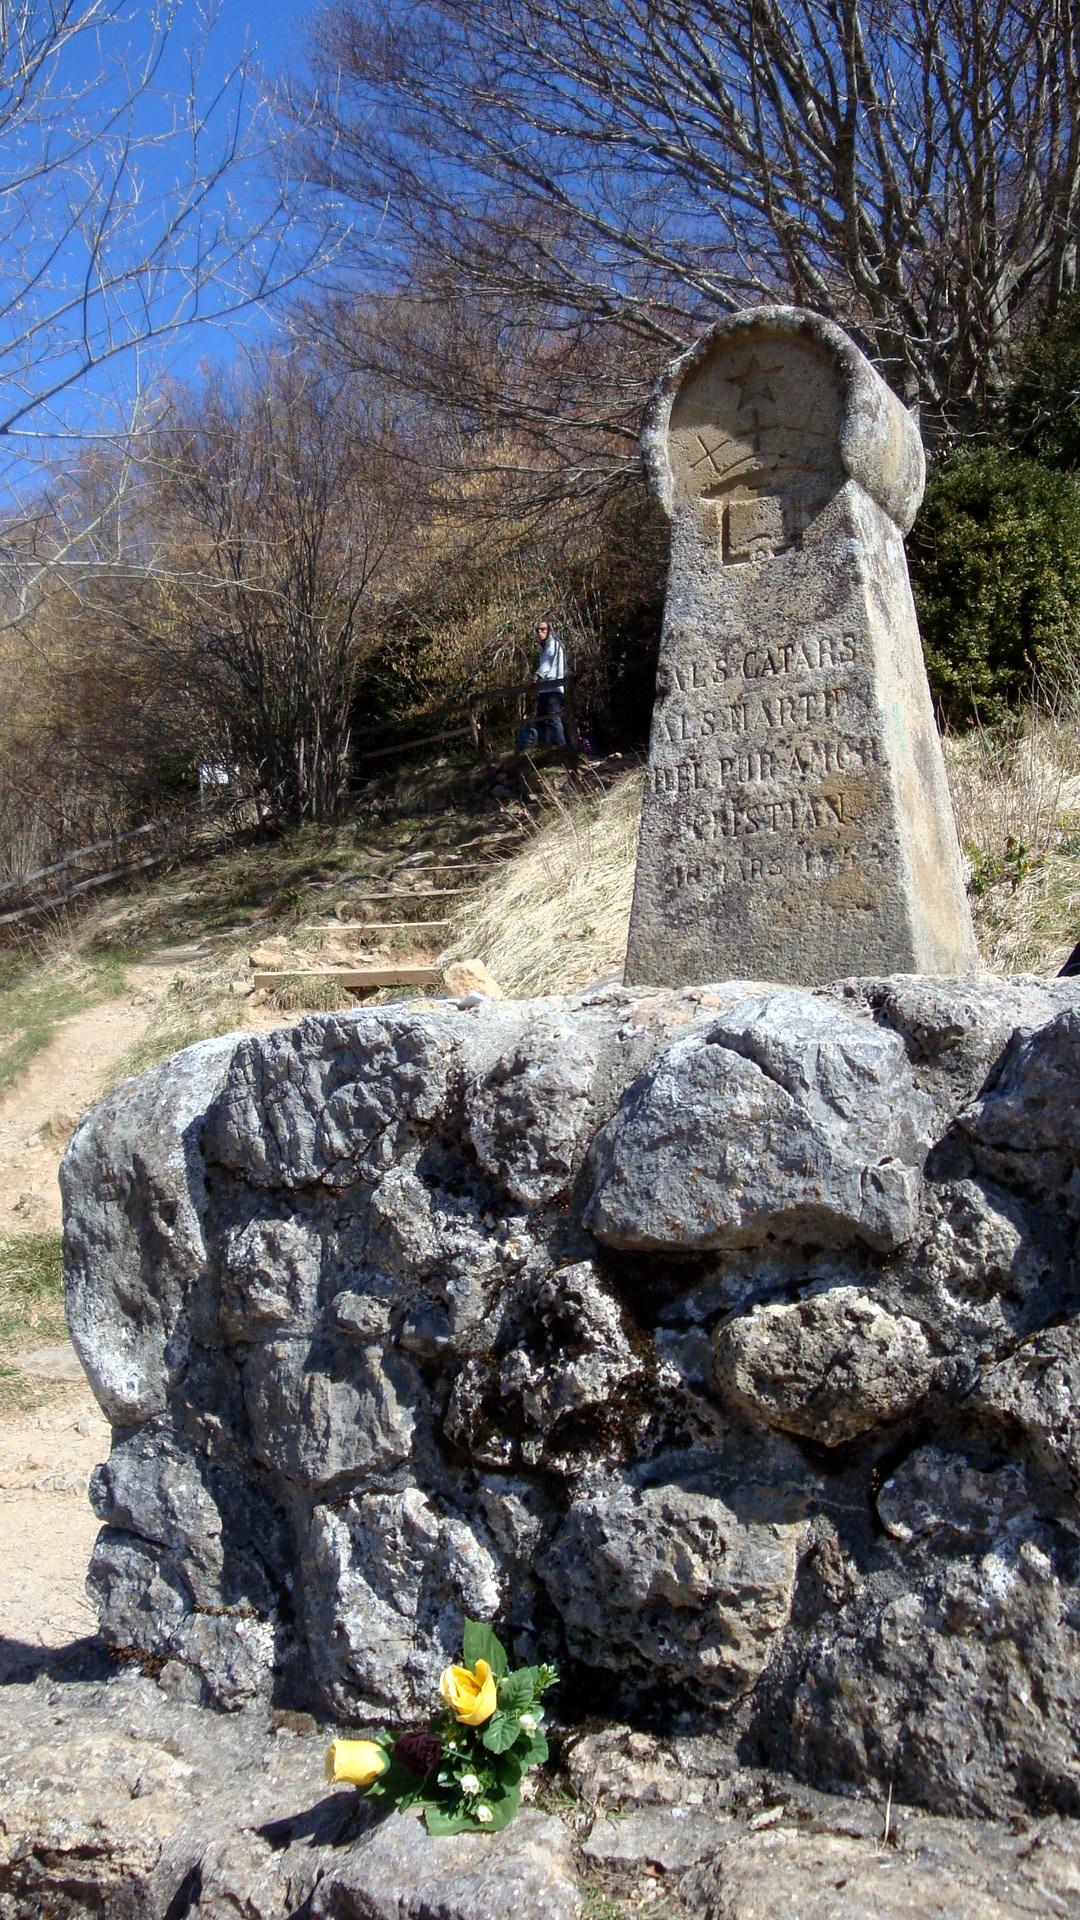 Monument at Montségur honoring those killed in the Crusade.